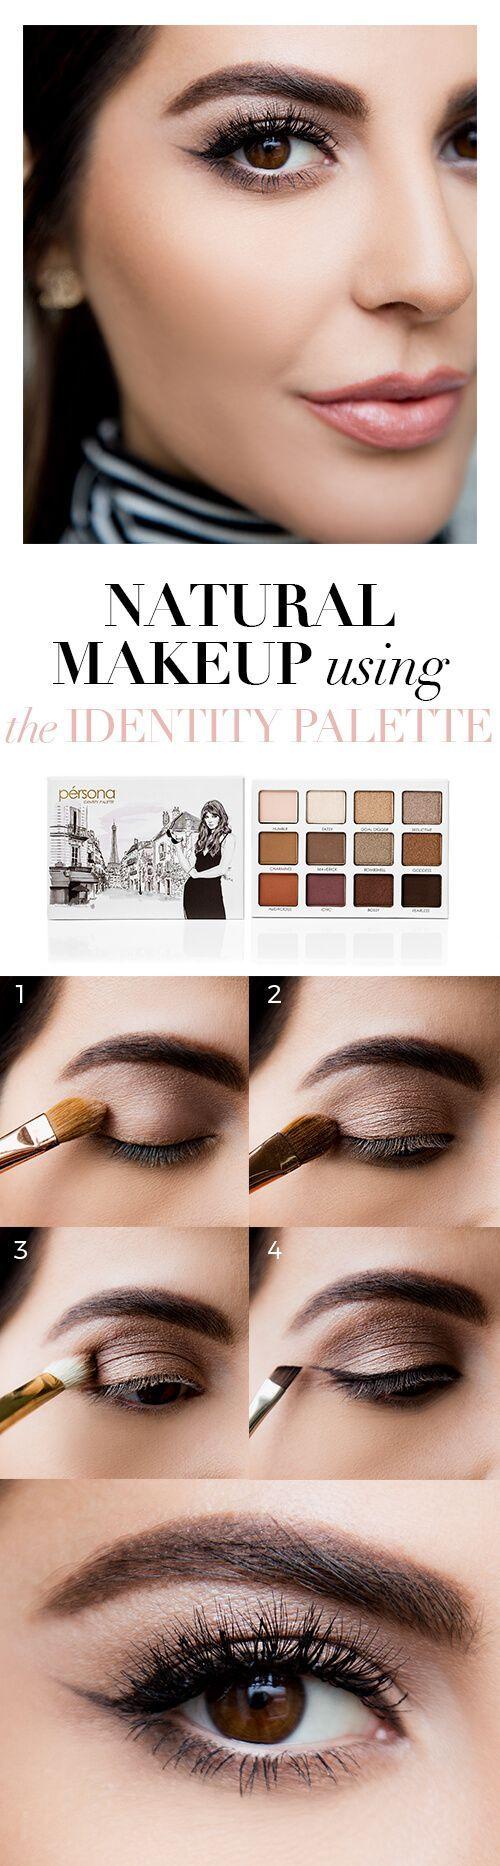 sona gasparian step by step tutorial natural makeup